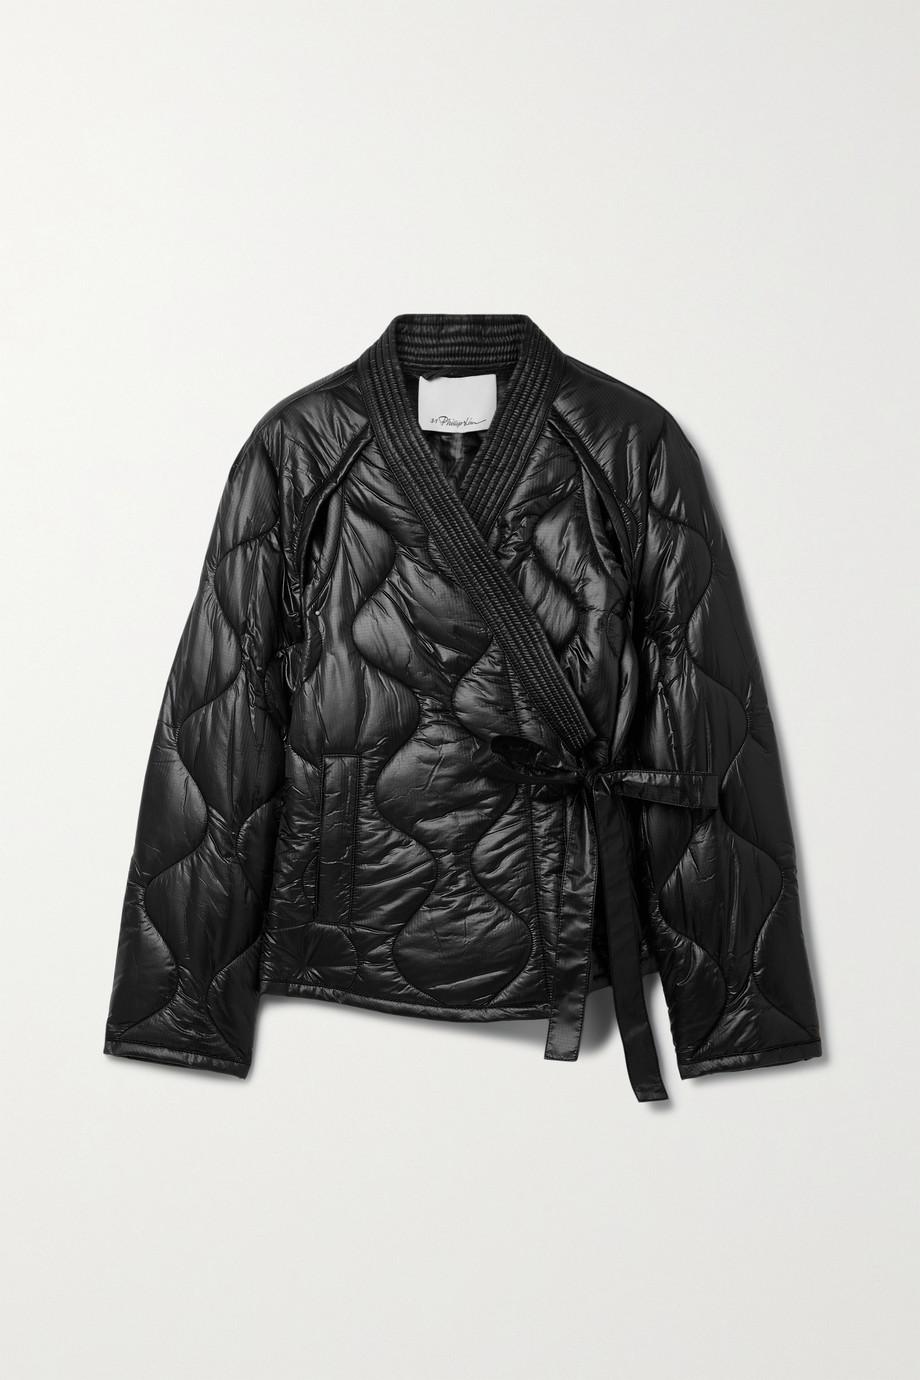 3.1 Phillip Lim 配腰带绗缝格子布外套